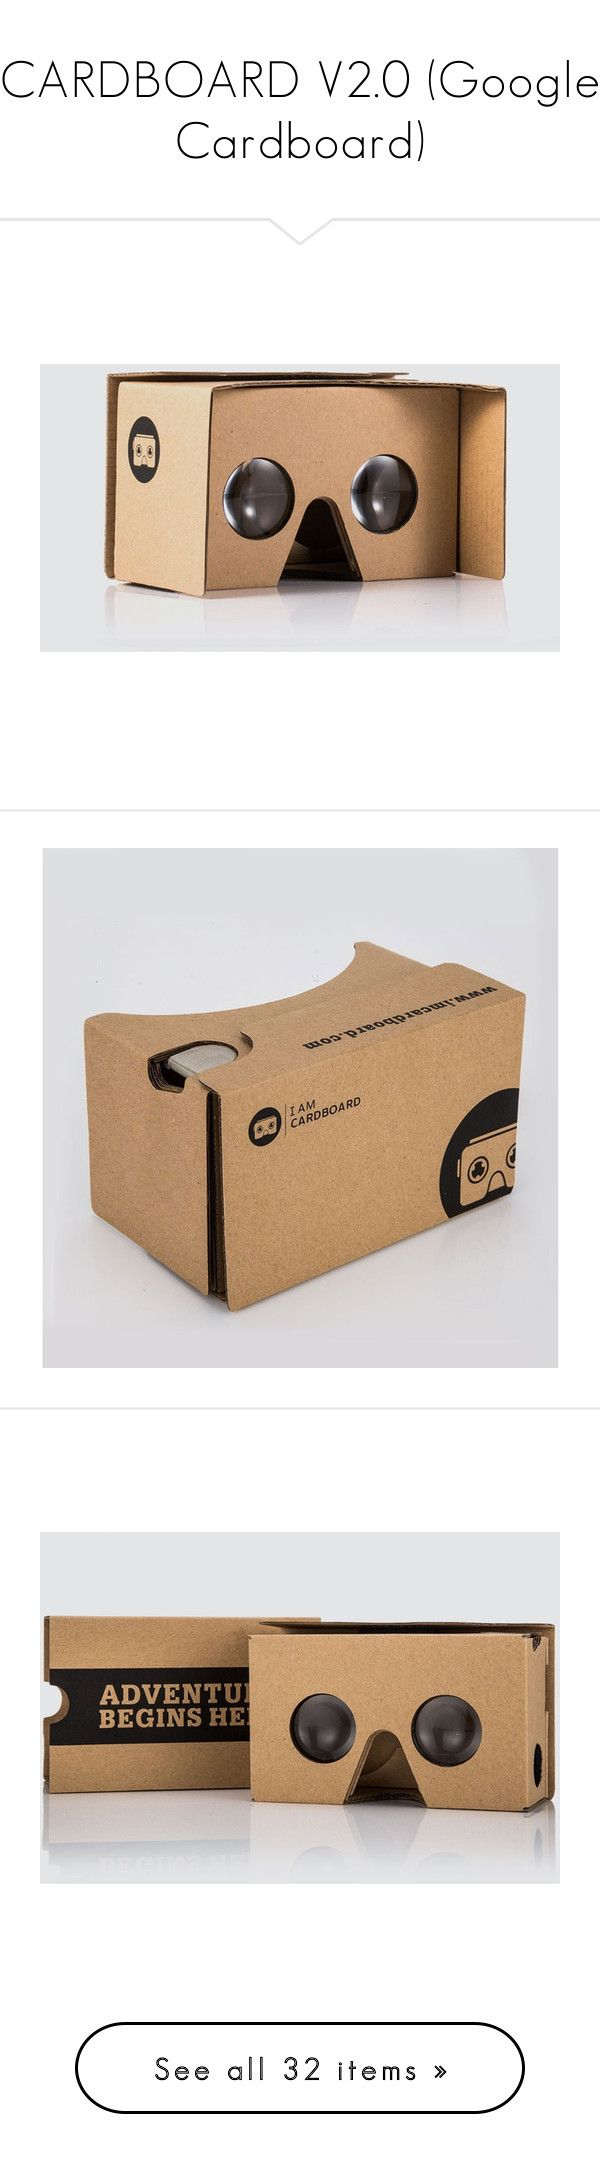 """CARDBOARD V2.0 (Google Cardboard)"" by hangar-knjiga ❤ liked on Polyvore featuring gaming, 360, vr, virtualreality and googlecardboard"